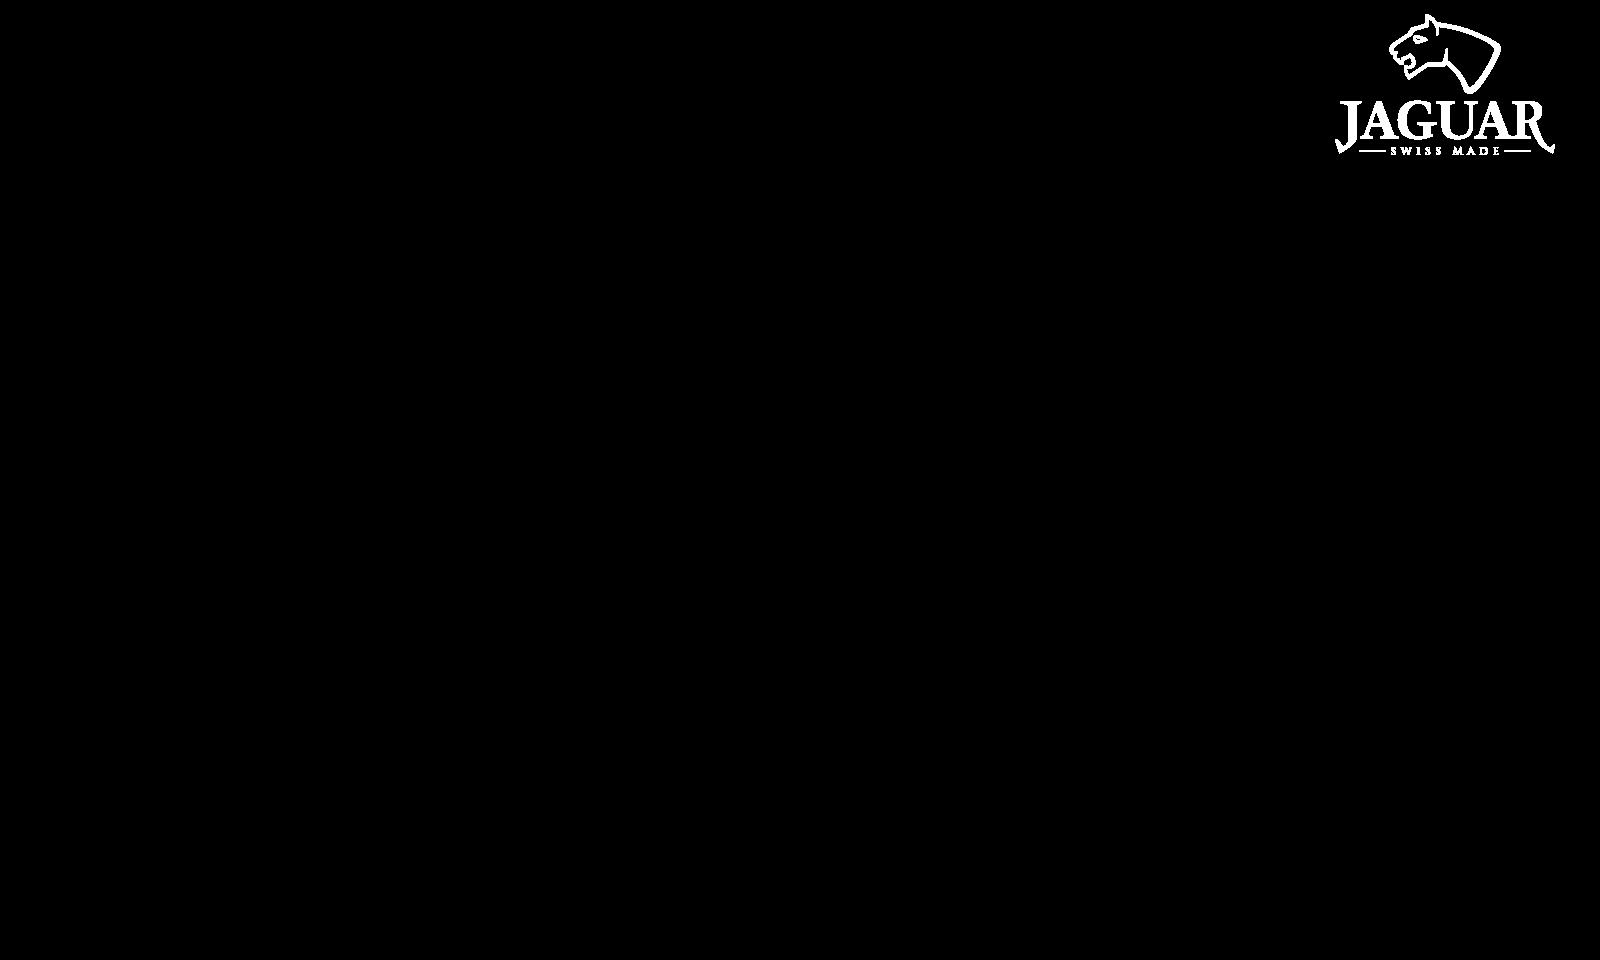 https://termekek.festina.hu/sites/default/files/revslider/image/jaguar_logo.png